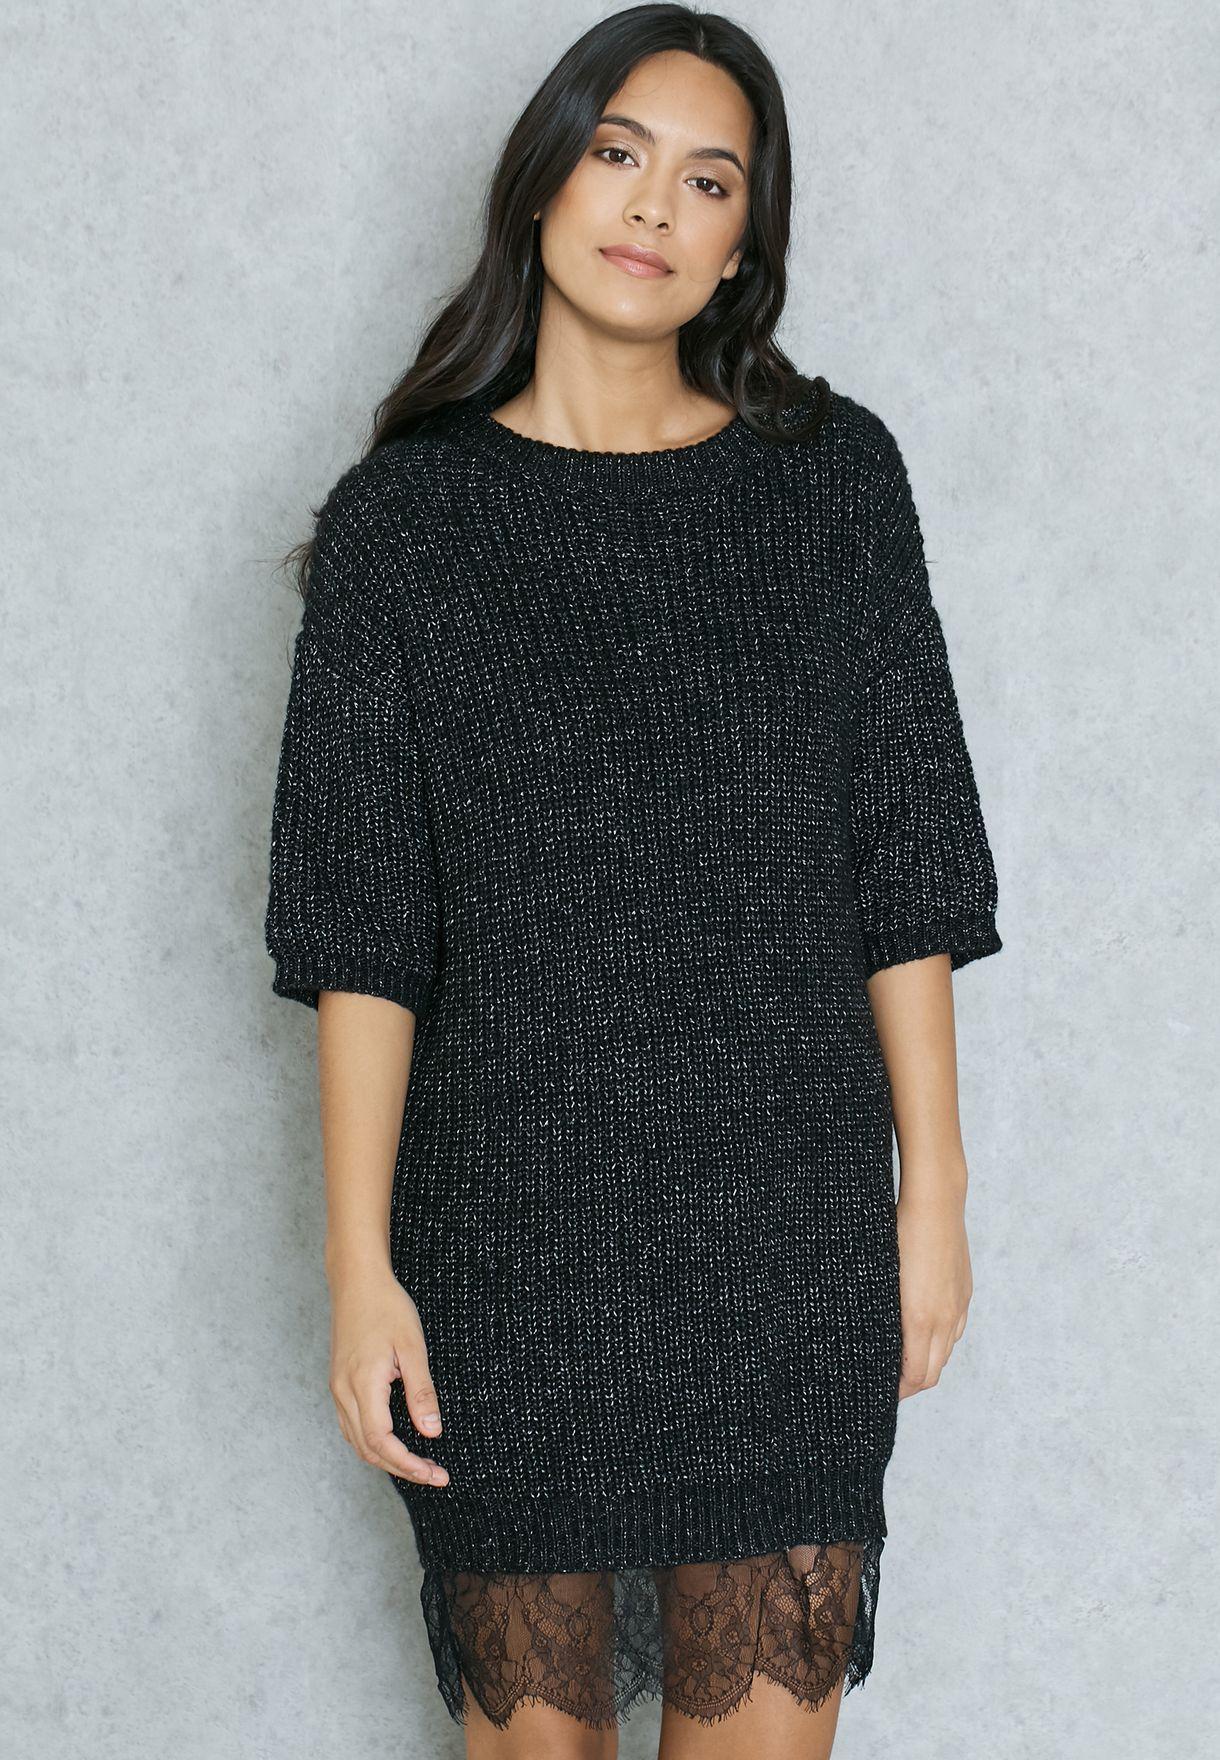 373375d49c1 Shop Ginger black Lace Hem Sweater Dress for Women in Qatar ...